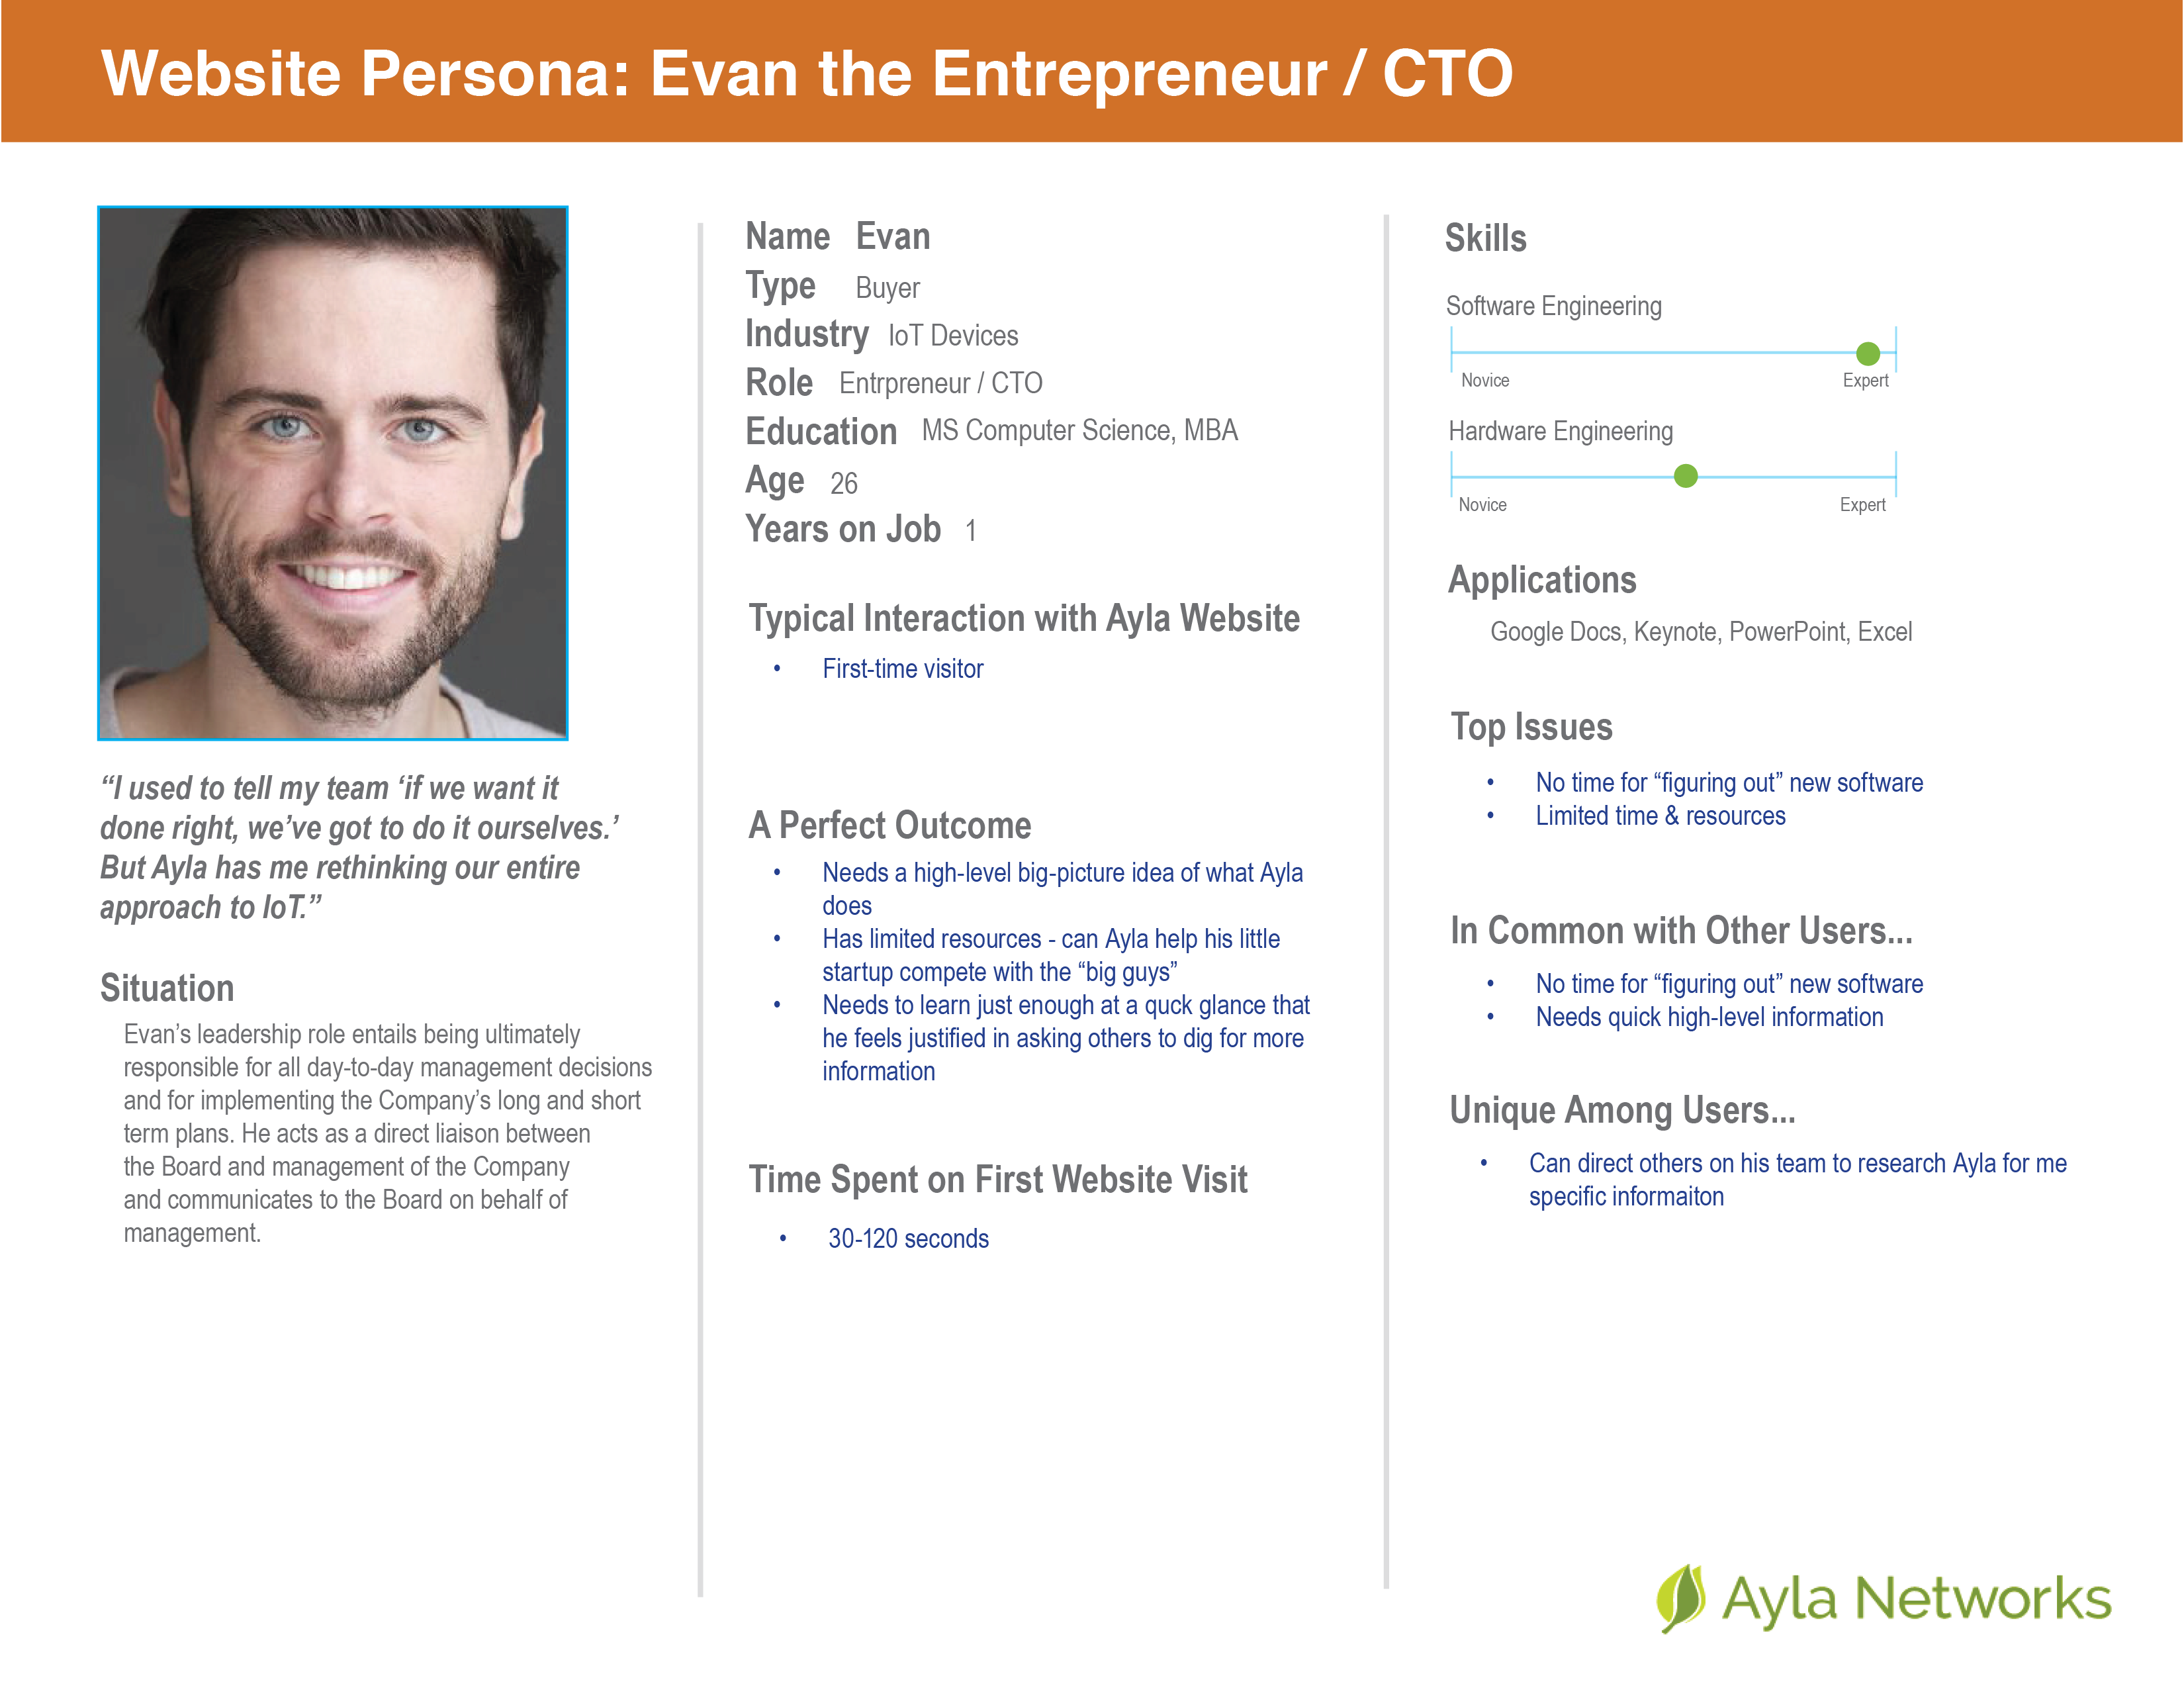 persona_web_cto_entrepreneur